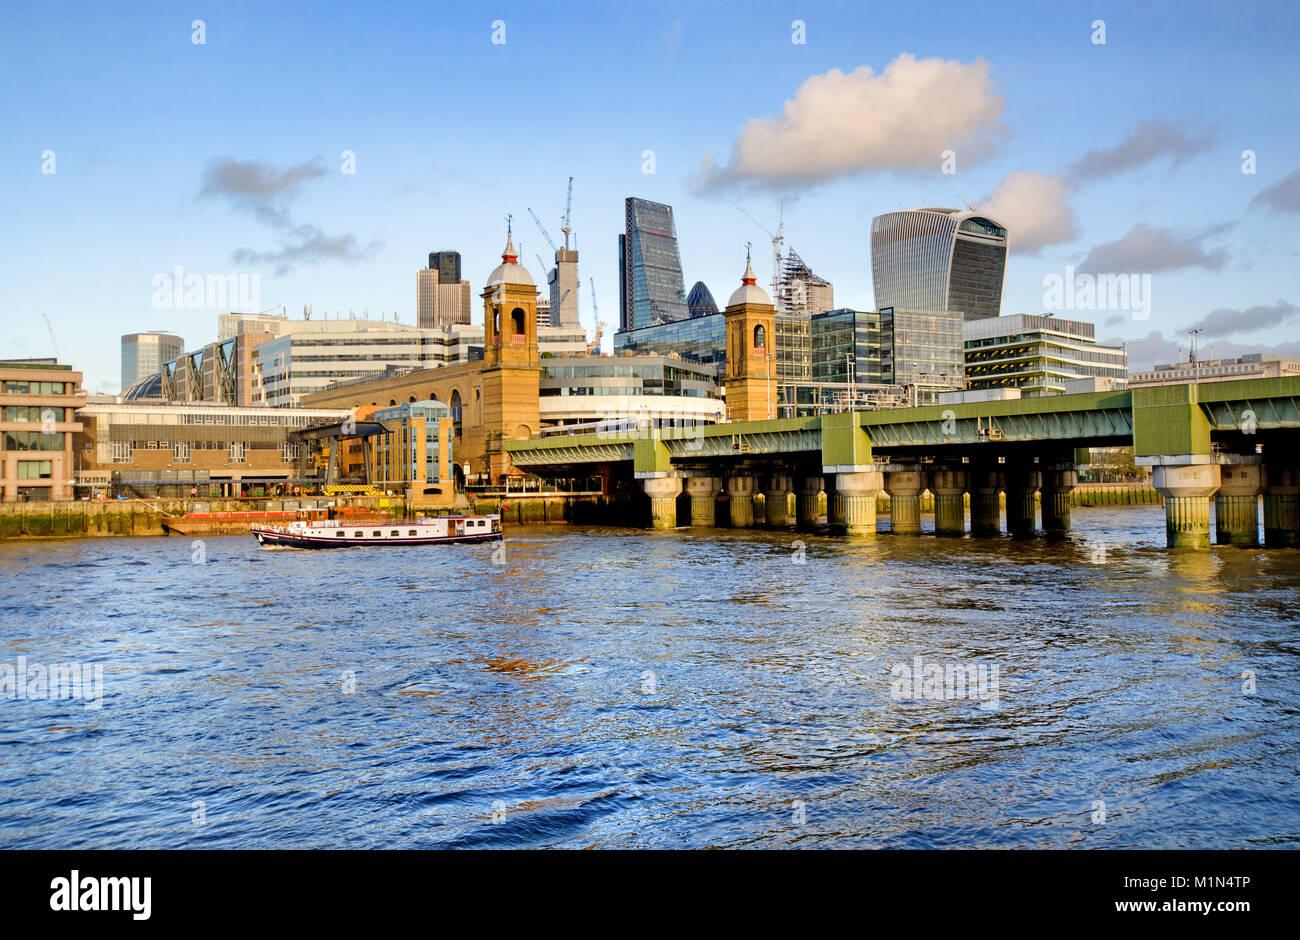 London, England, UK. Cannon Street Rail Bridge and station - The City skyline behind - Stock Image